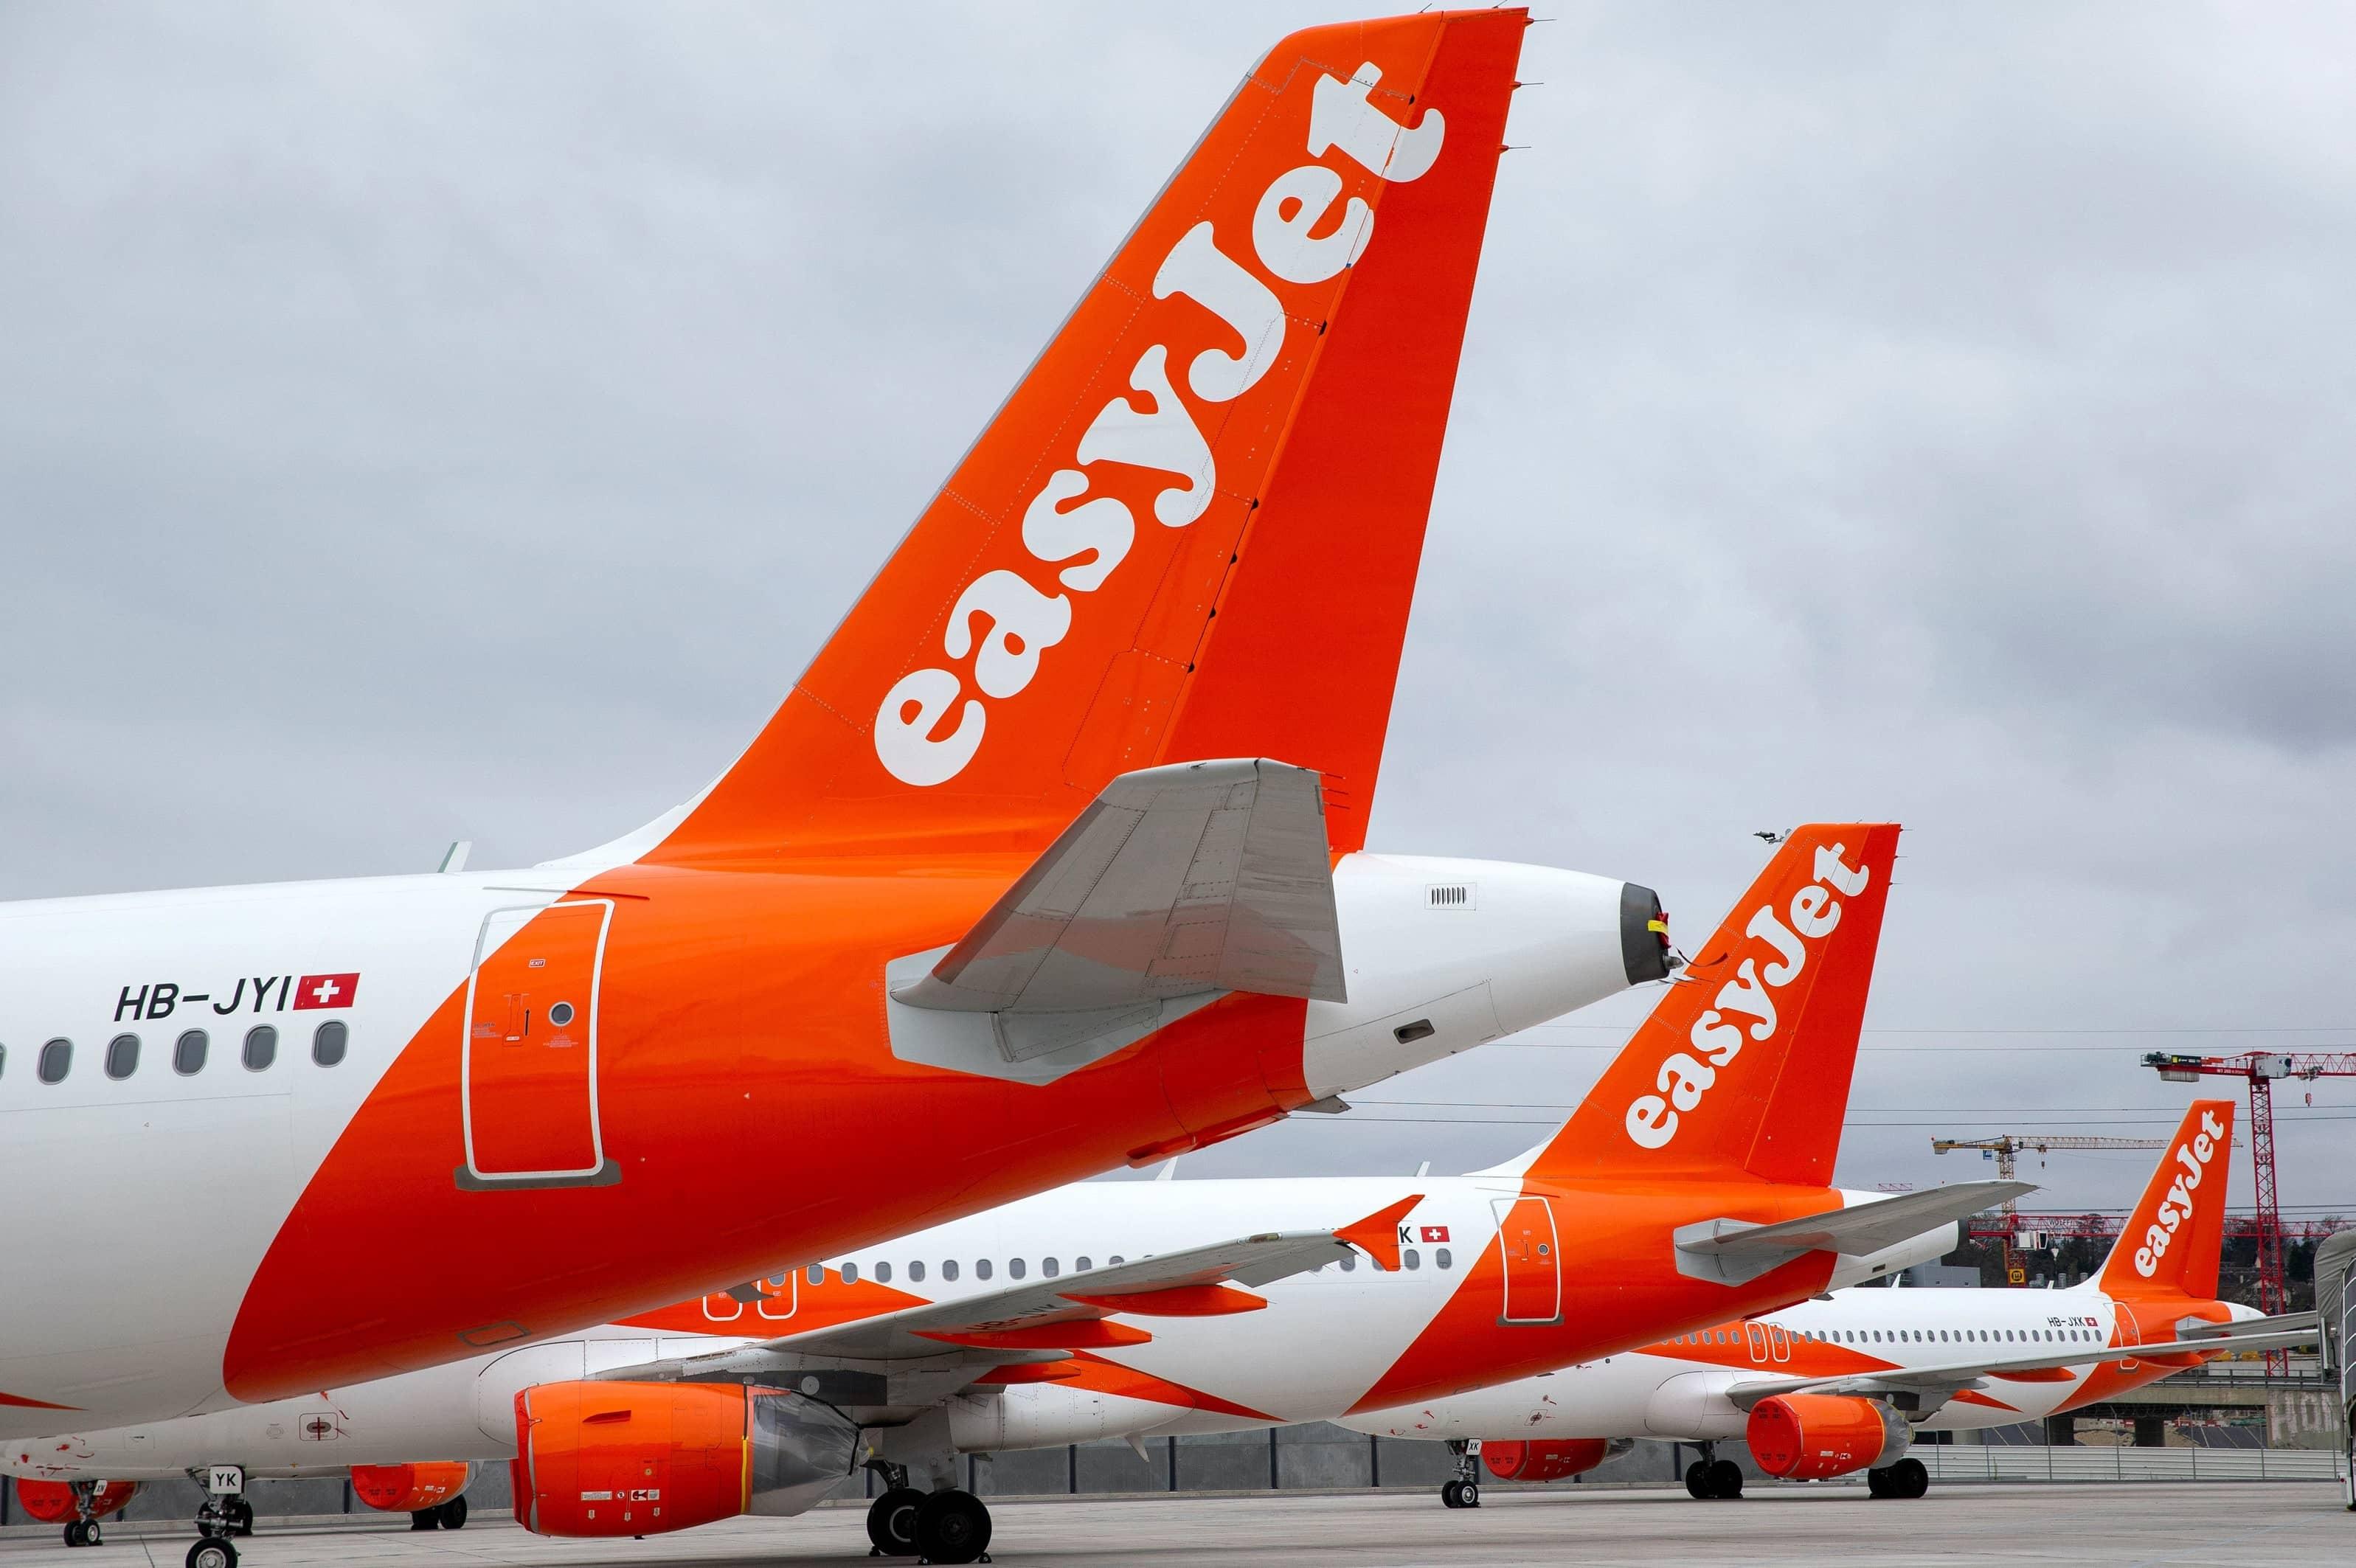 Easy Jet Reveals 'Sophisticated' Hack of Customer Details